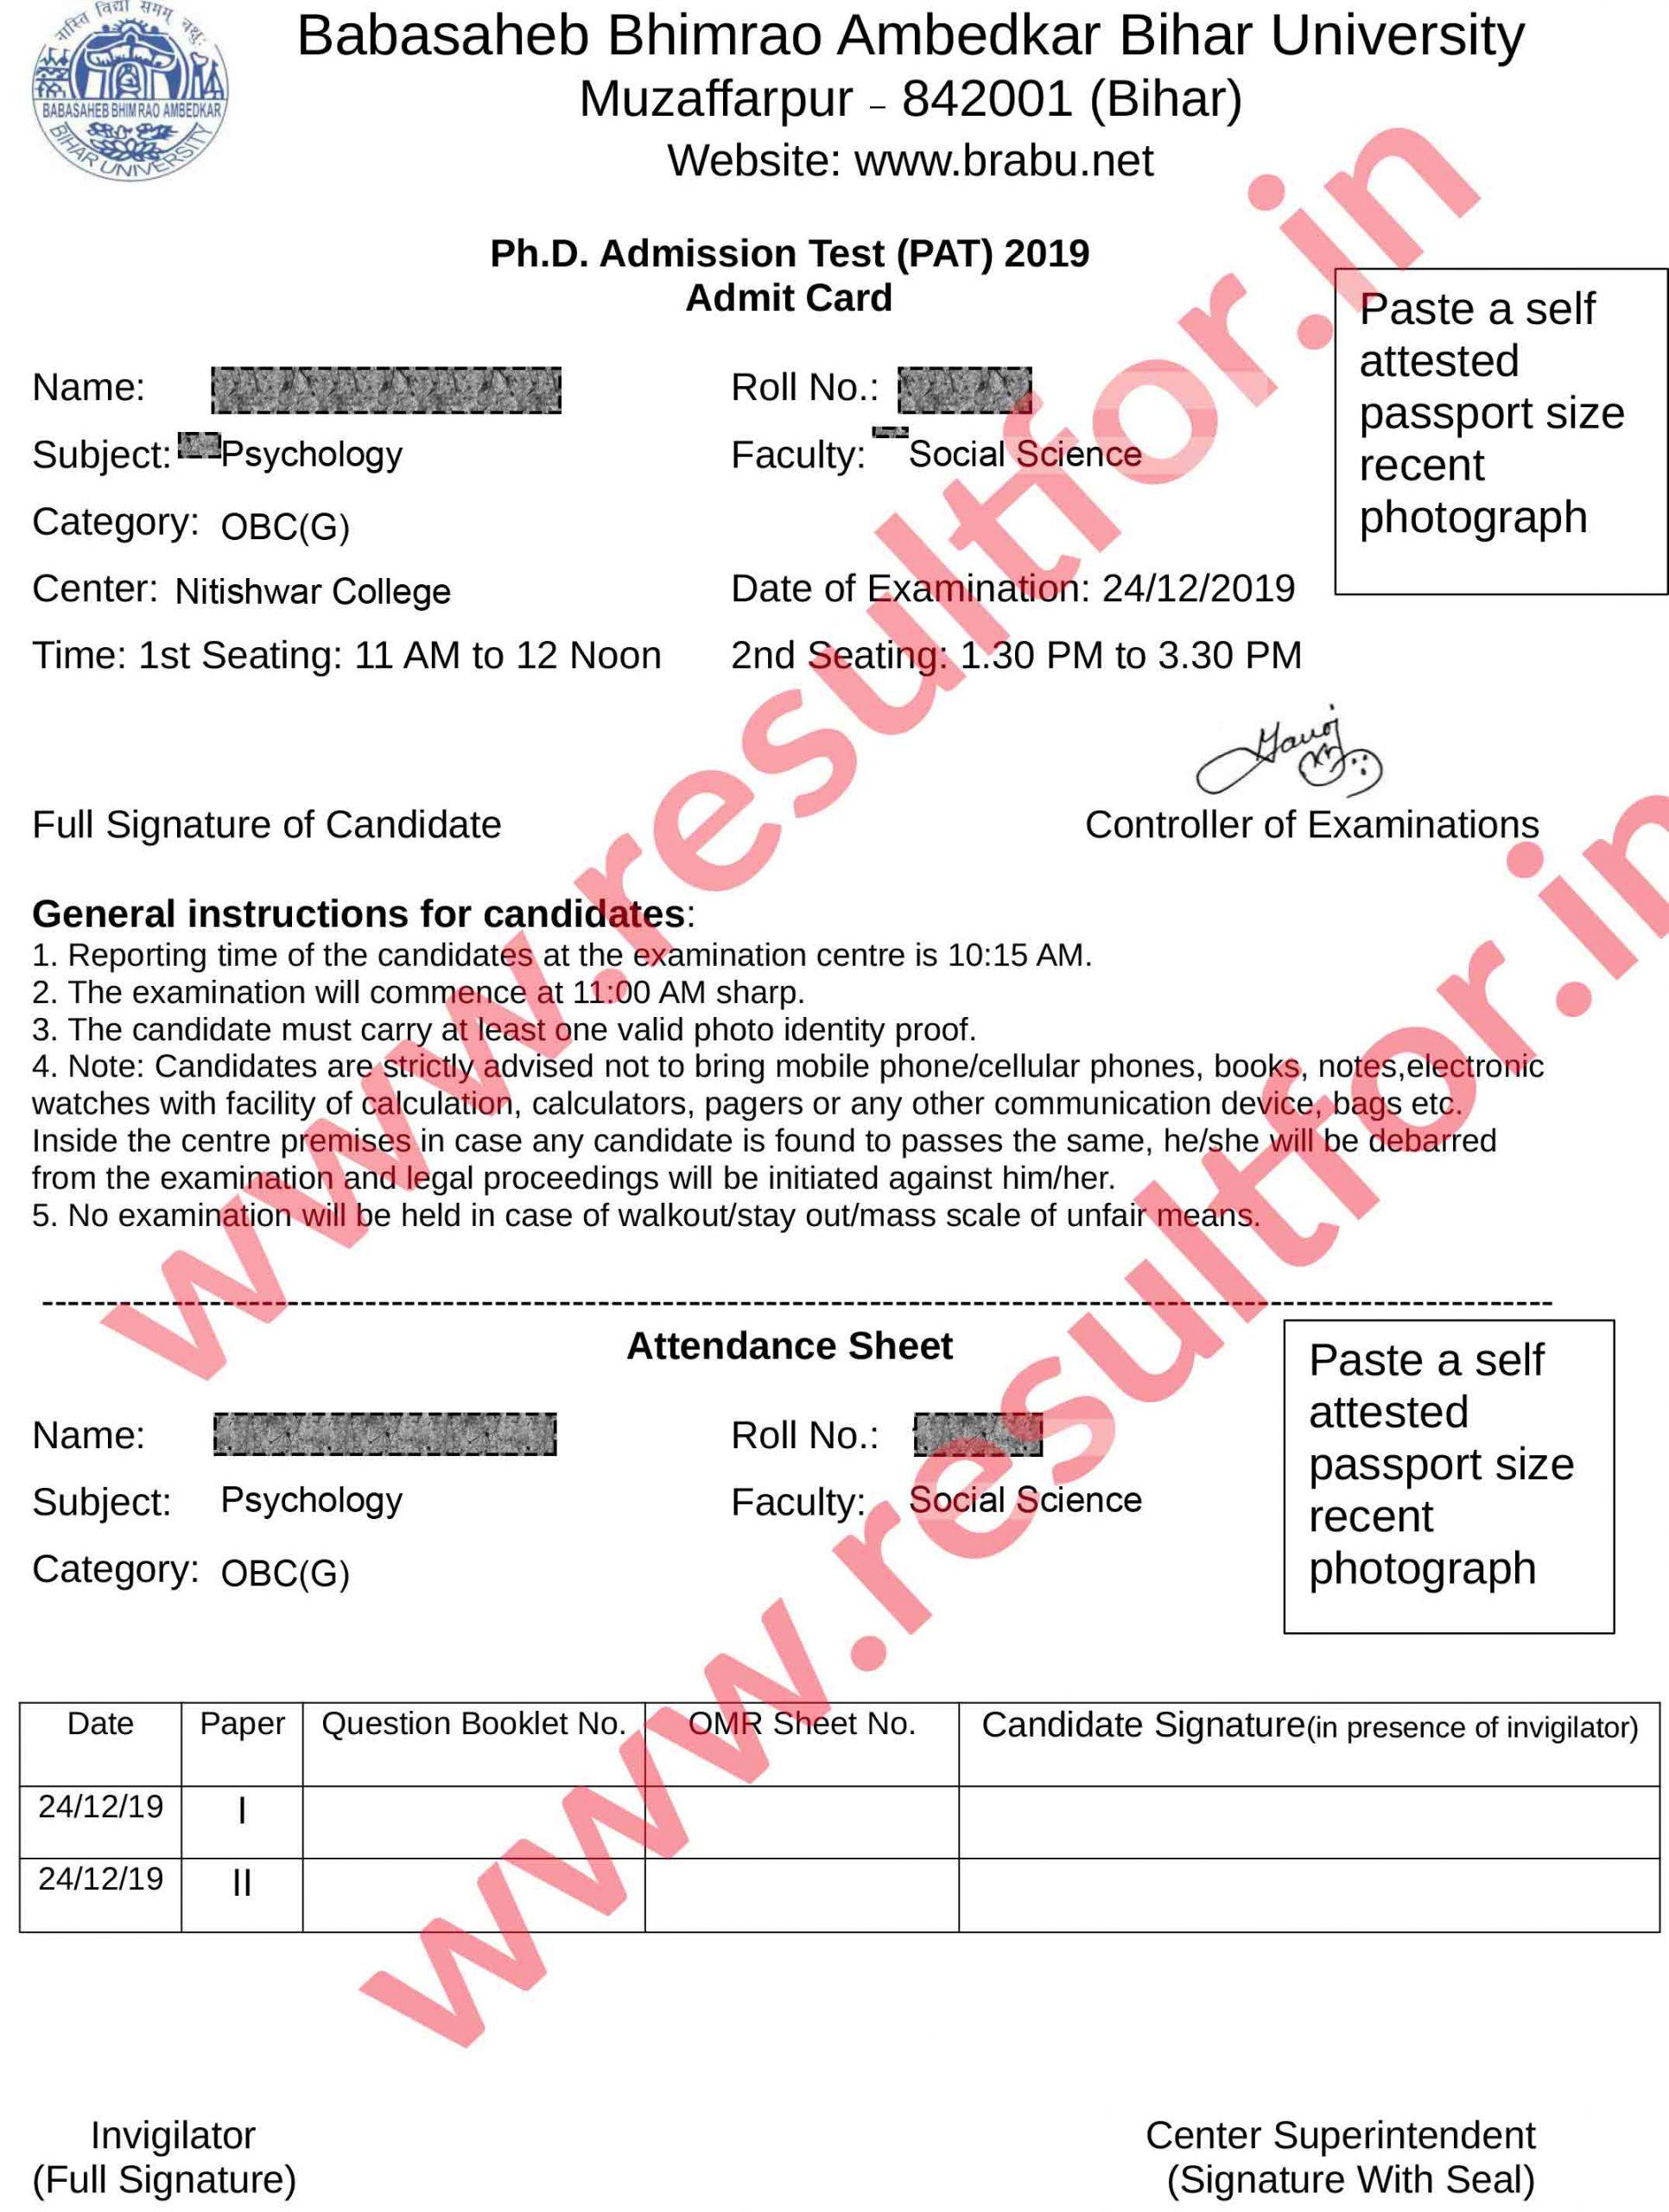 bihar university brabu muzaffarpur phd admission entrance test admit card